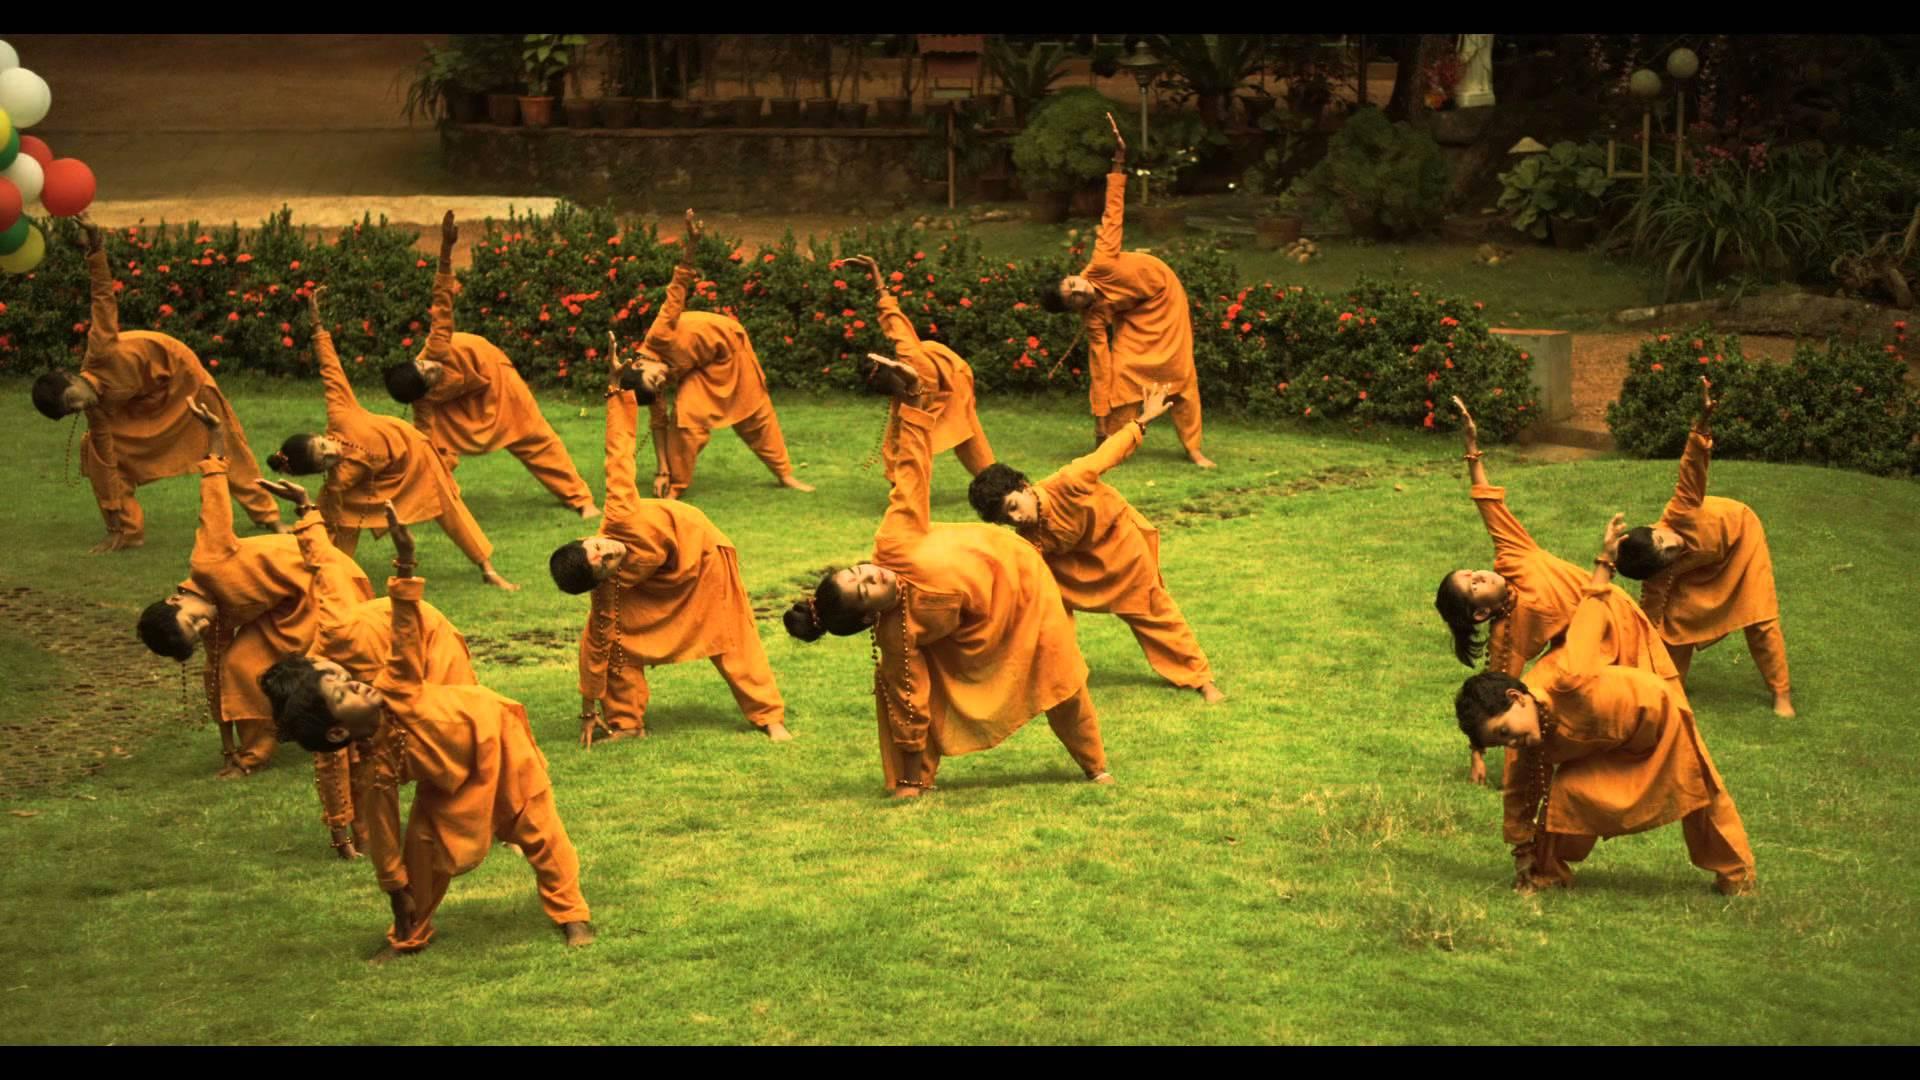 Йога в Индия | Loyal Travel Blog